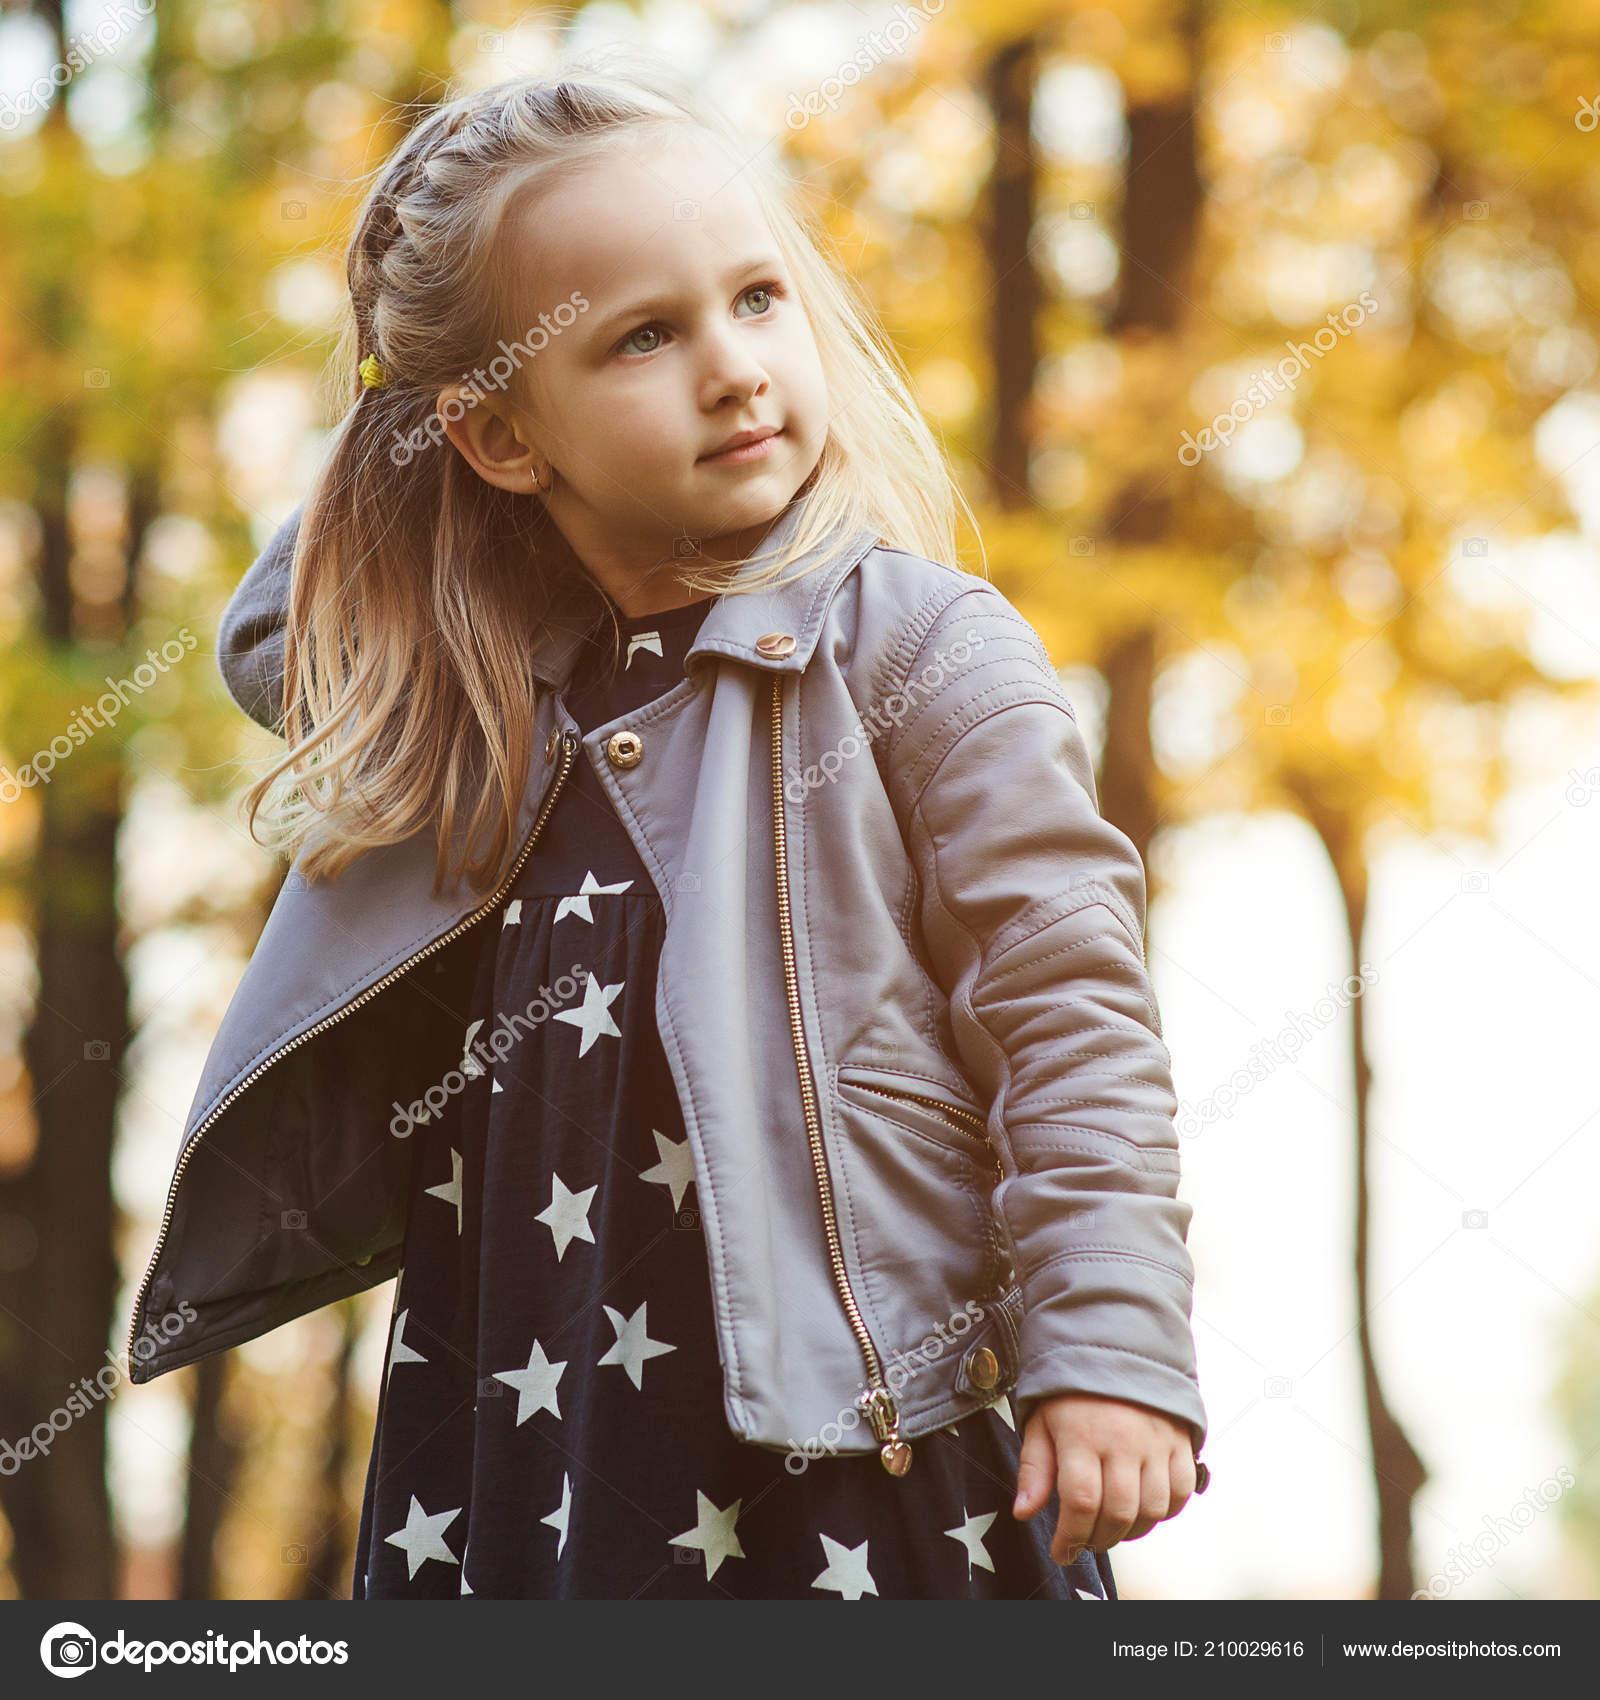 d40a664f200 Ευτυχισμένη παιδική ηλικία. Κομψό κορίτσι παίζει στο πάρκο της πόλης. Φθινοπωρινή  μόδα για τα παιδιά. Εποχιακές πωλήσεις — Εικόνα από Volurol